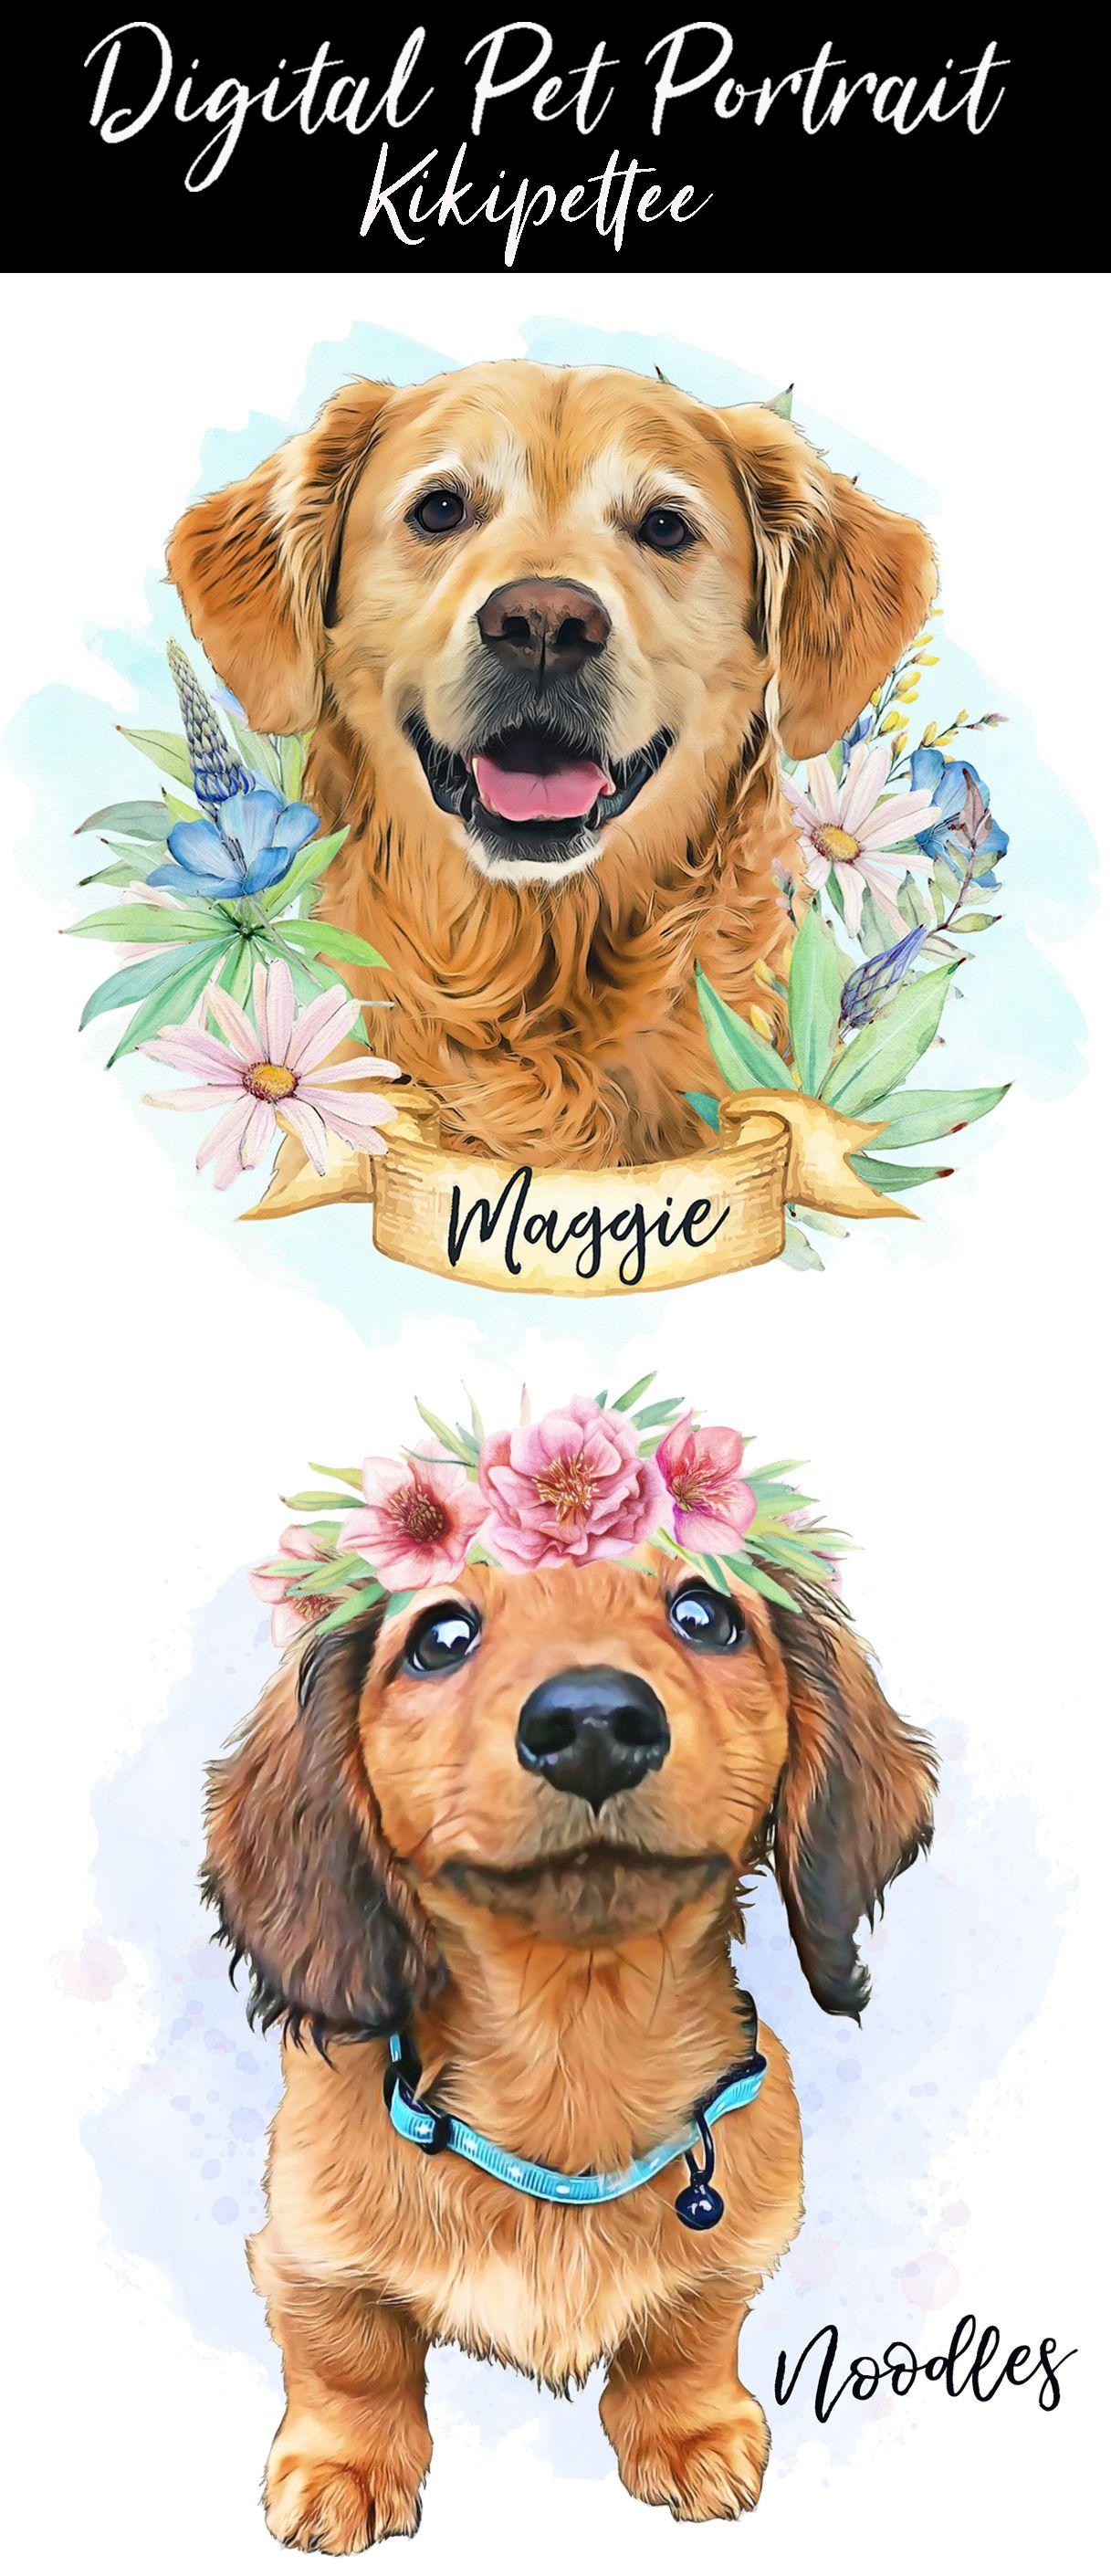 Digital Pet PortraitCustom dog portraitpet loss giftChristmas